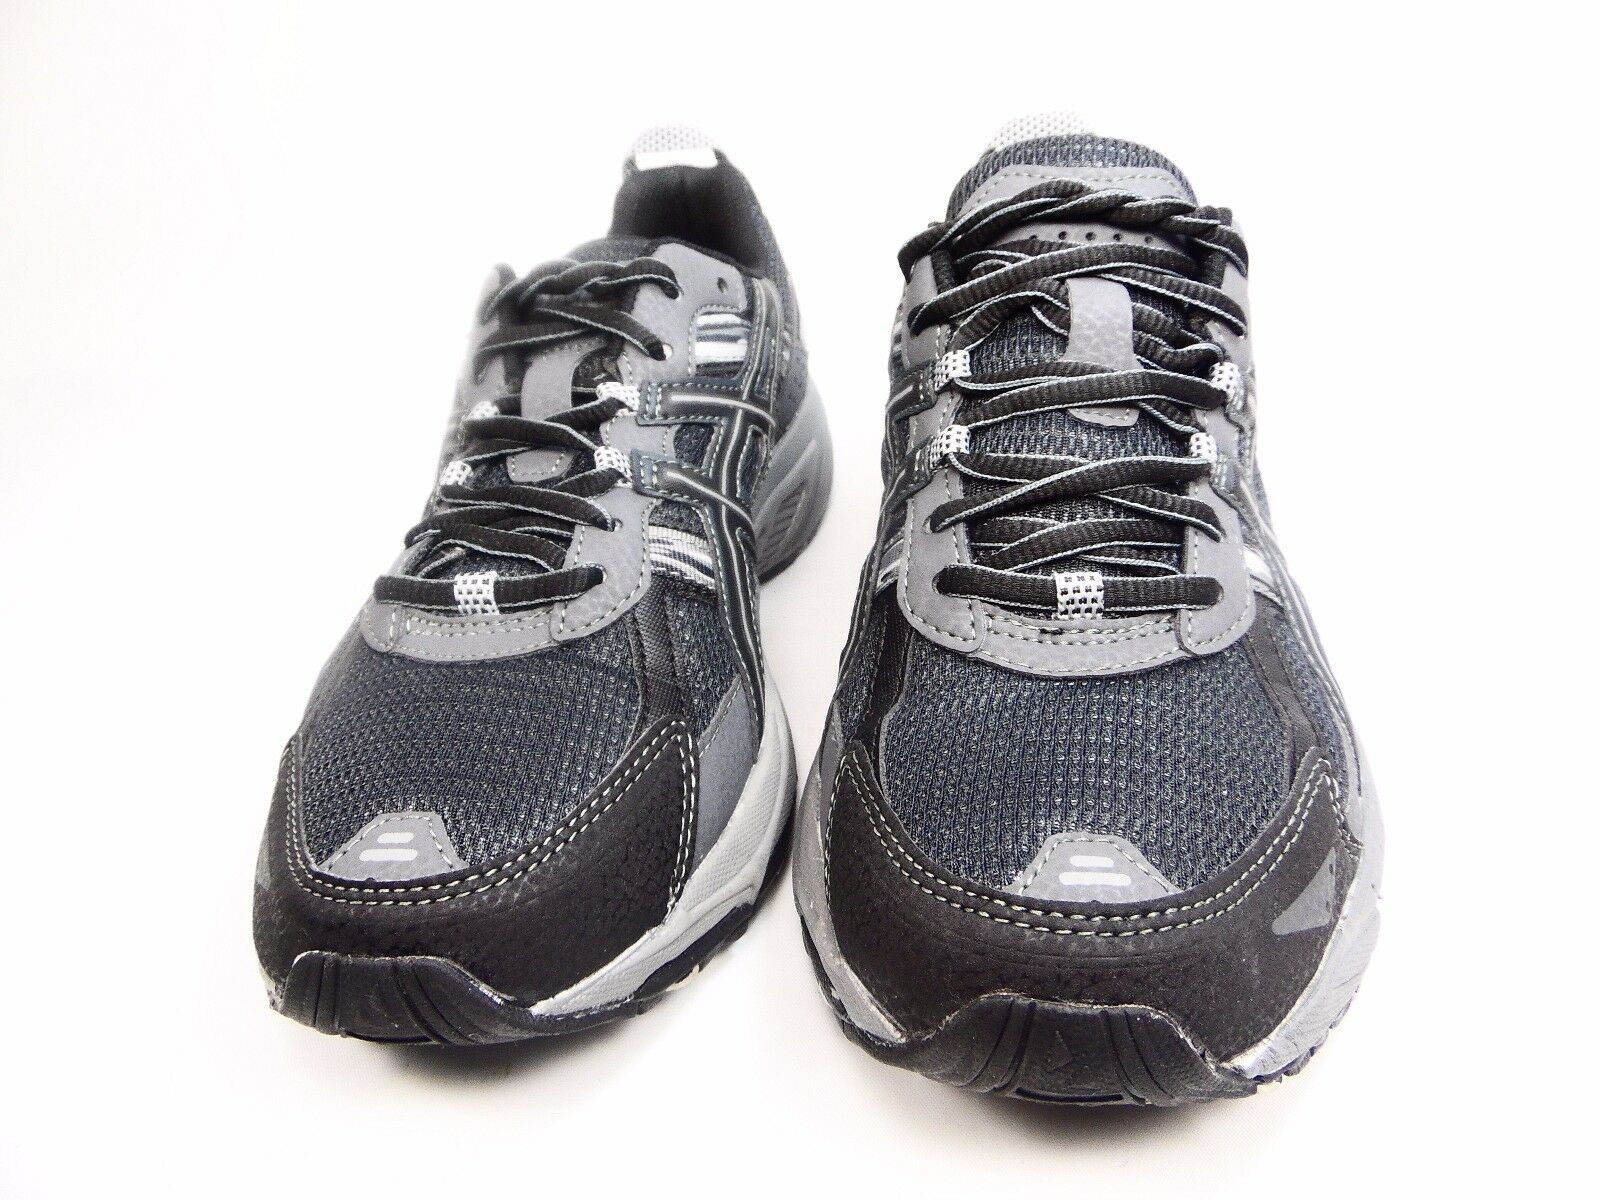 ASICS GEL-Venture 5 Mens Running schuhe  Blk Onyx Charcoal US 84E